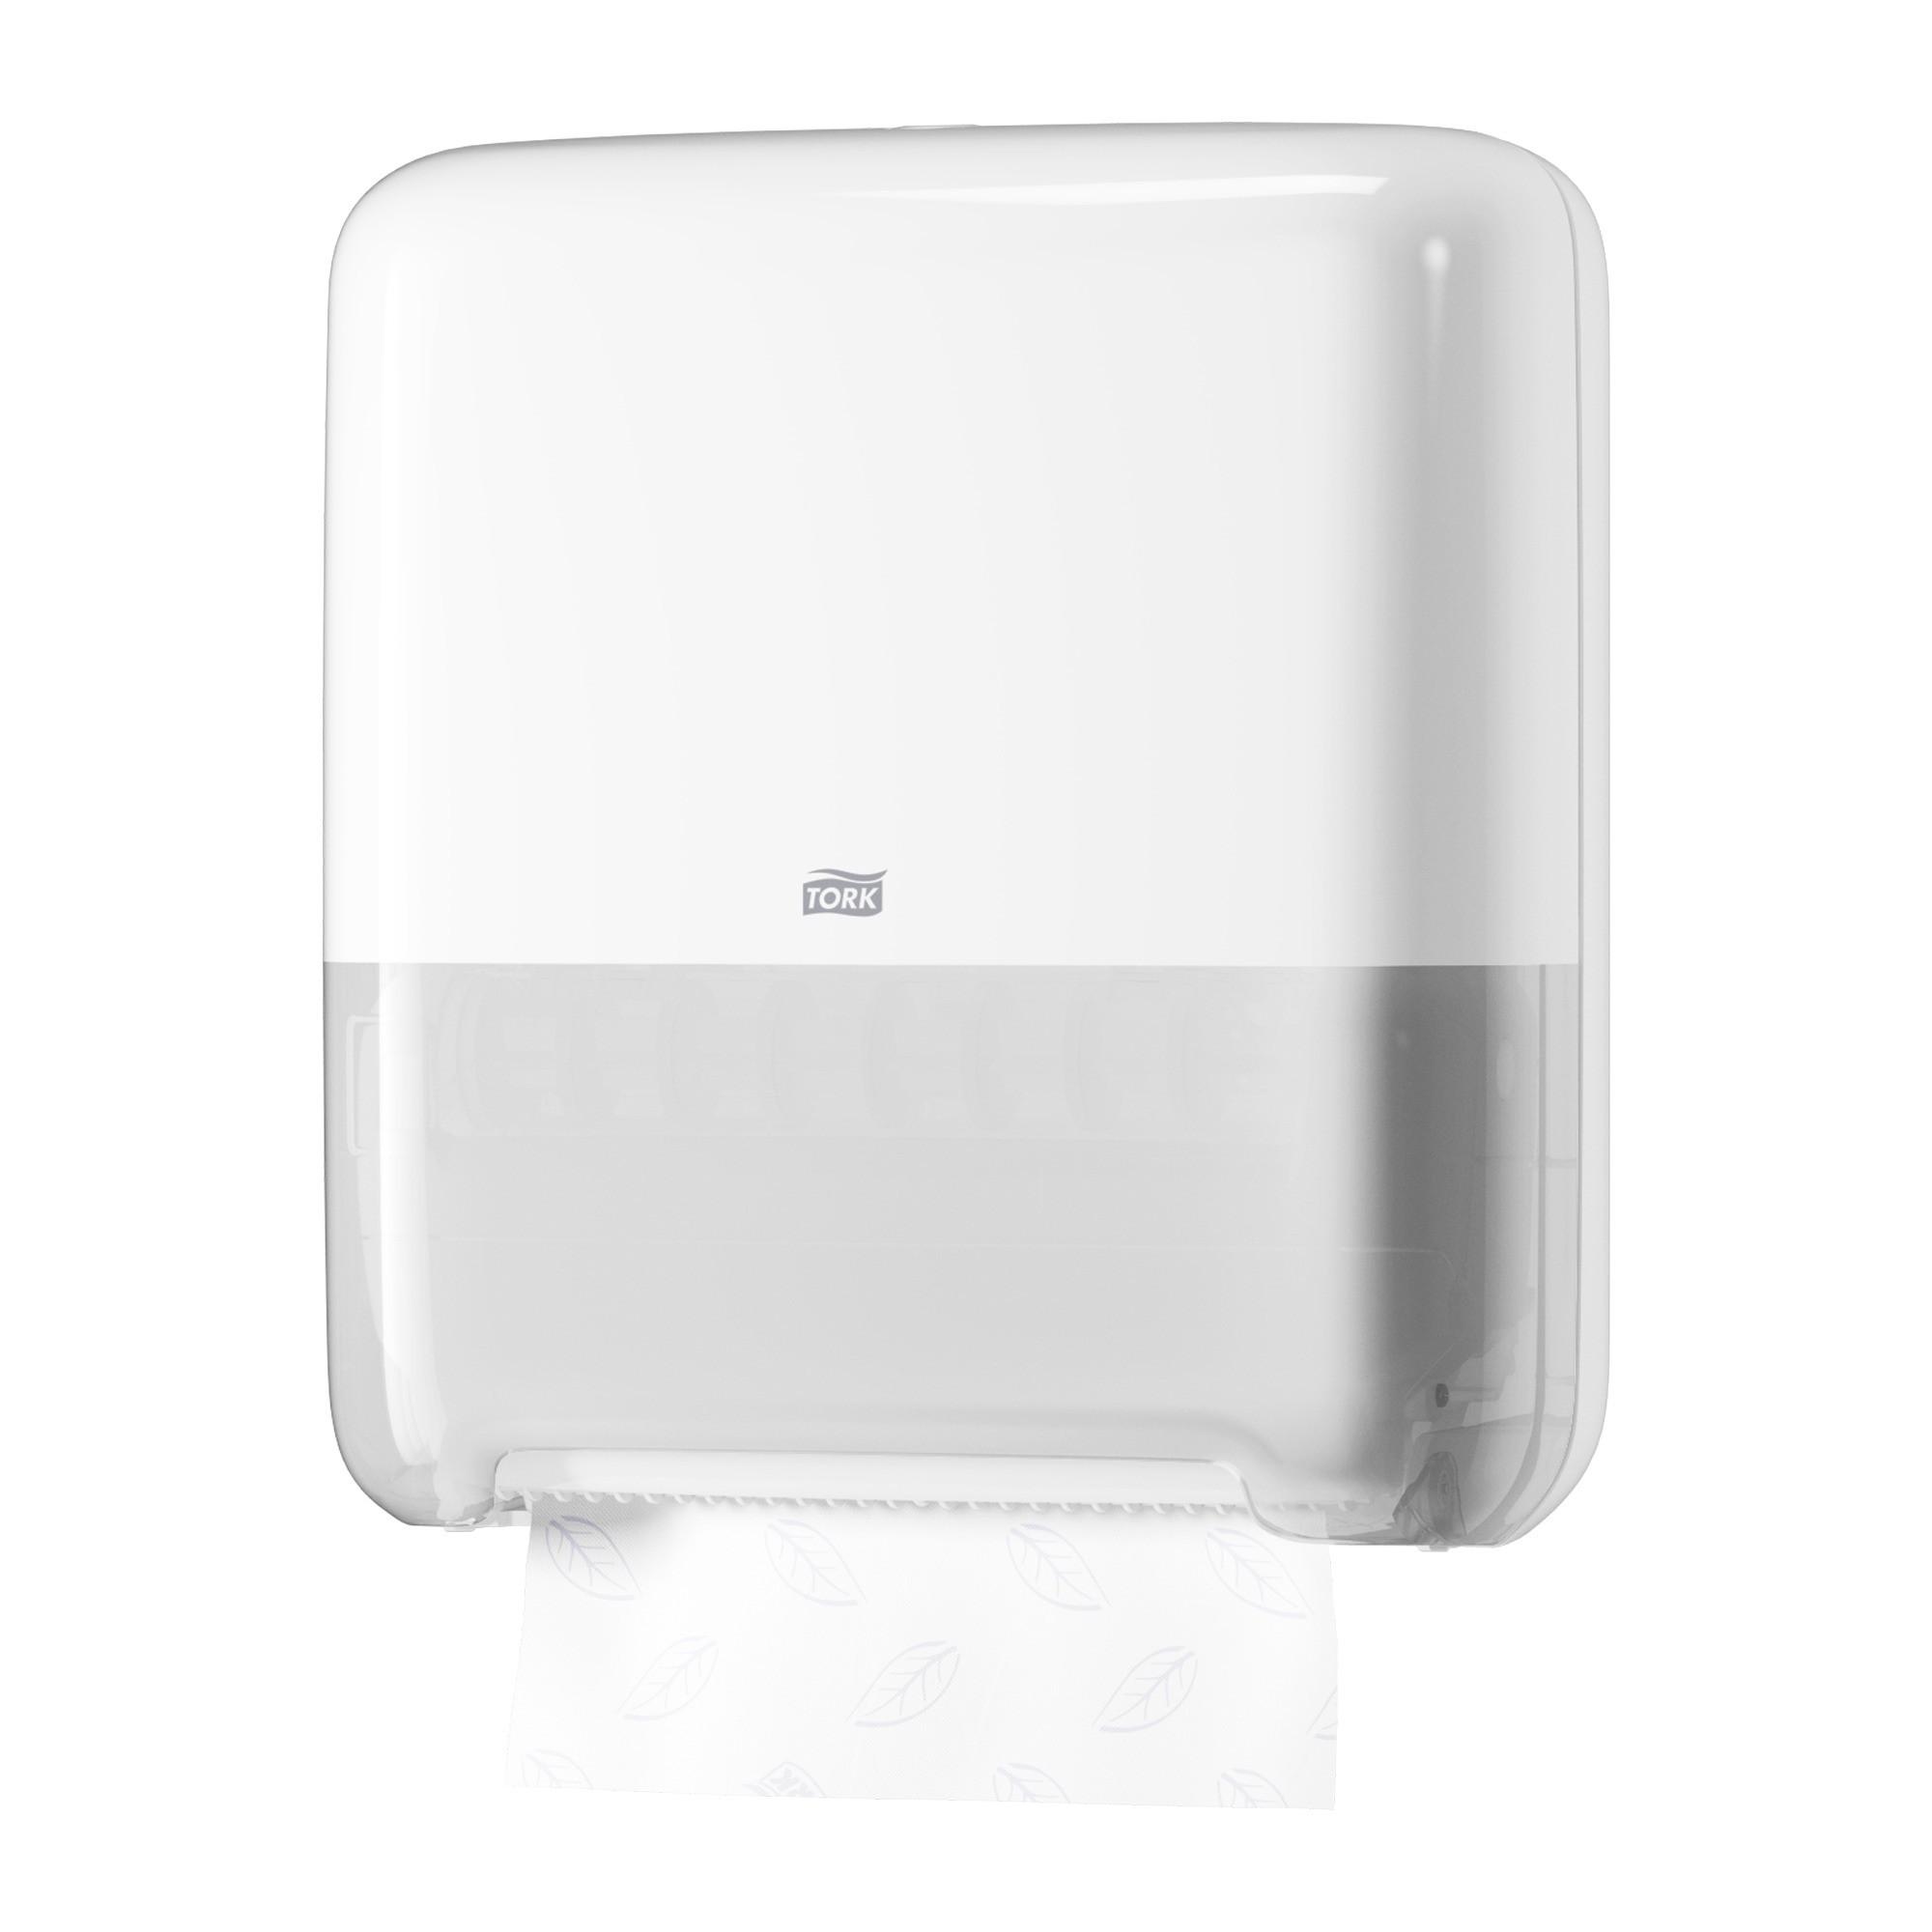 Dispenser Tork para Papel Toalha Rolo Matic Branco H1